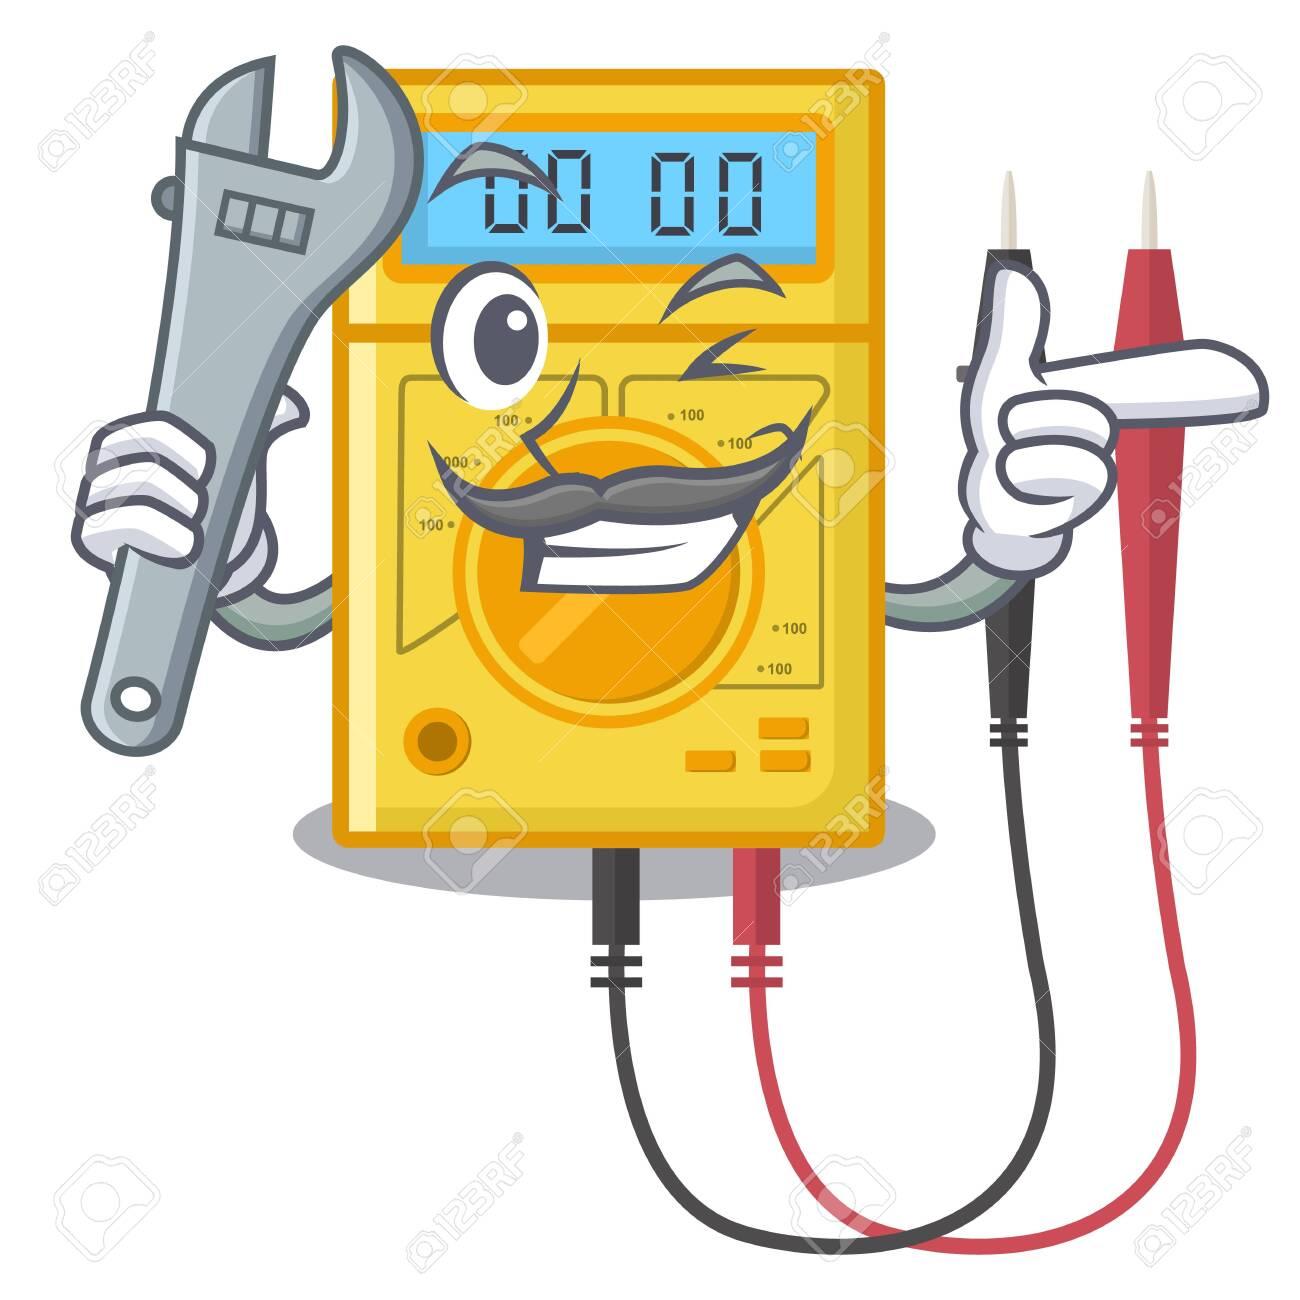 Mechanic digital multimeter sticks to the cartoon wall - 124502418